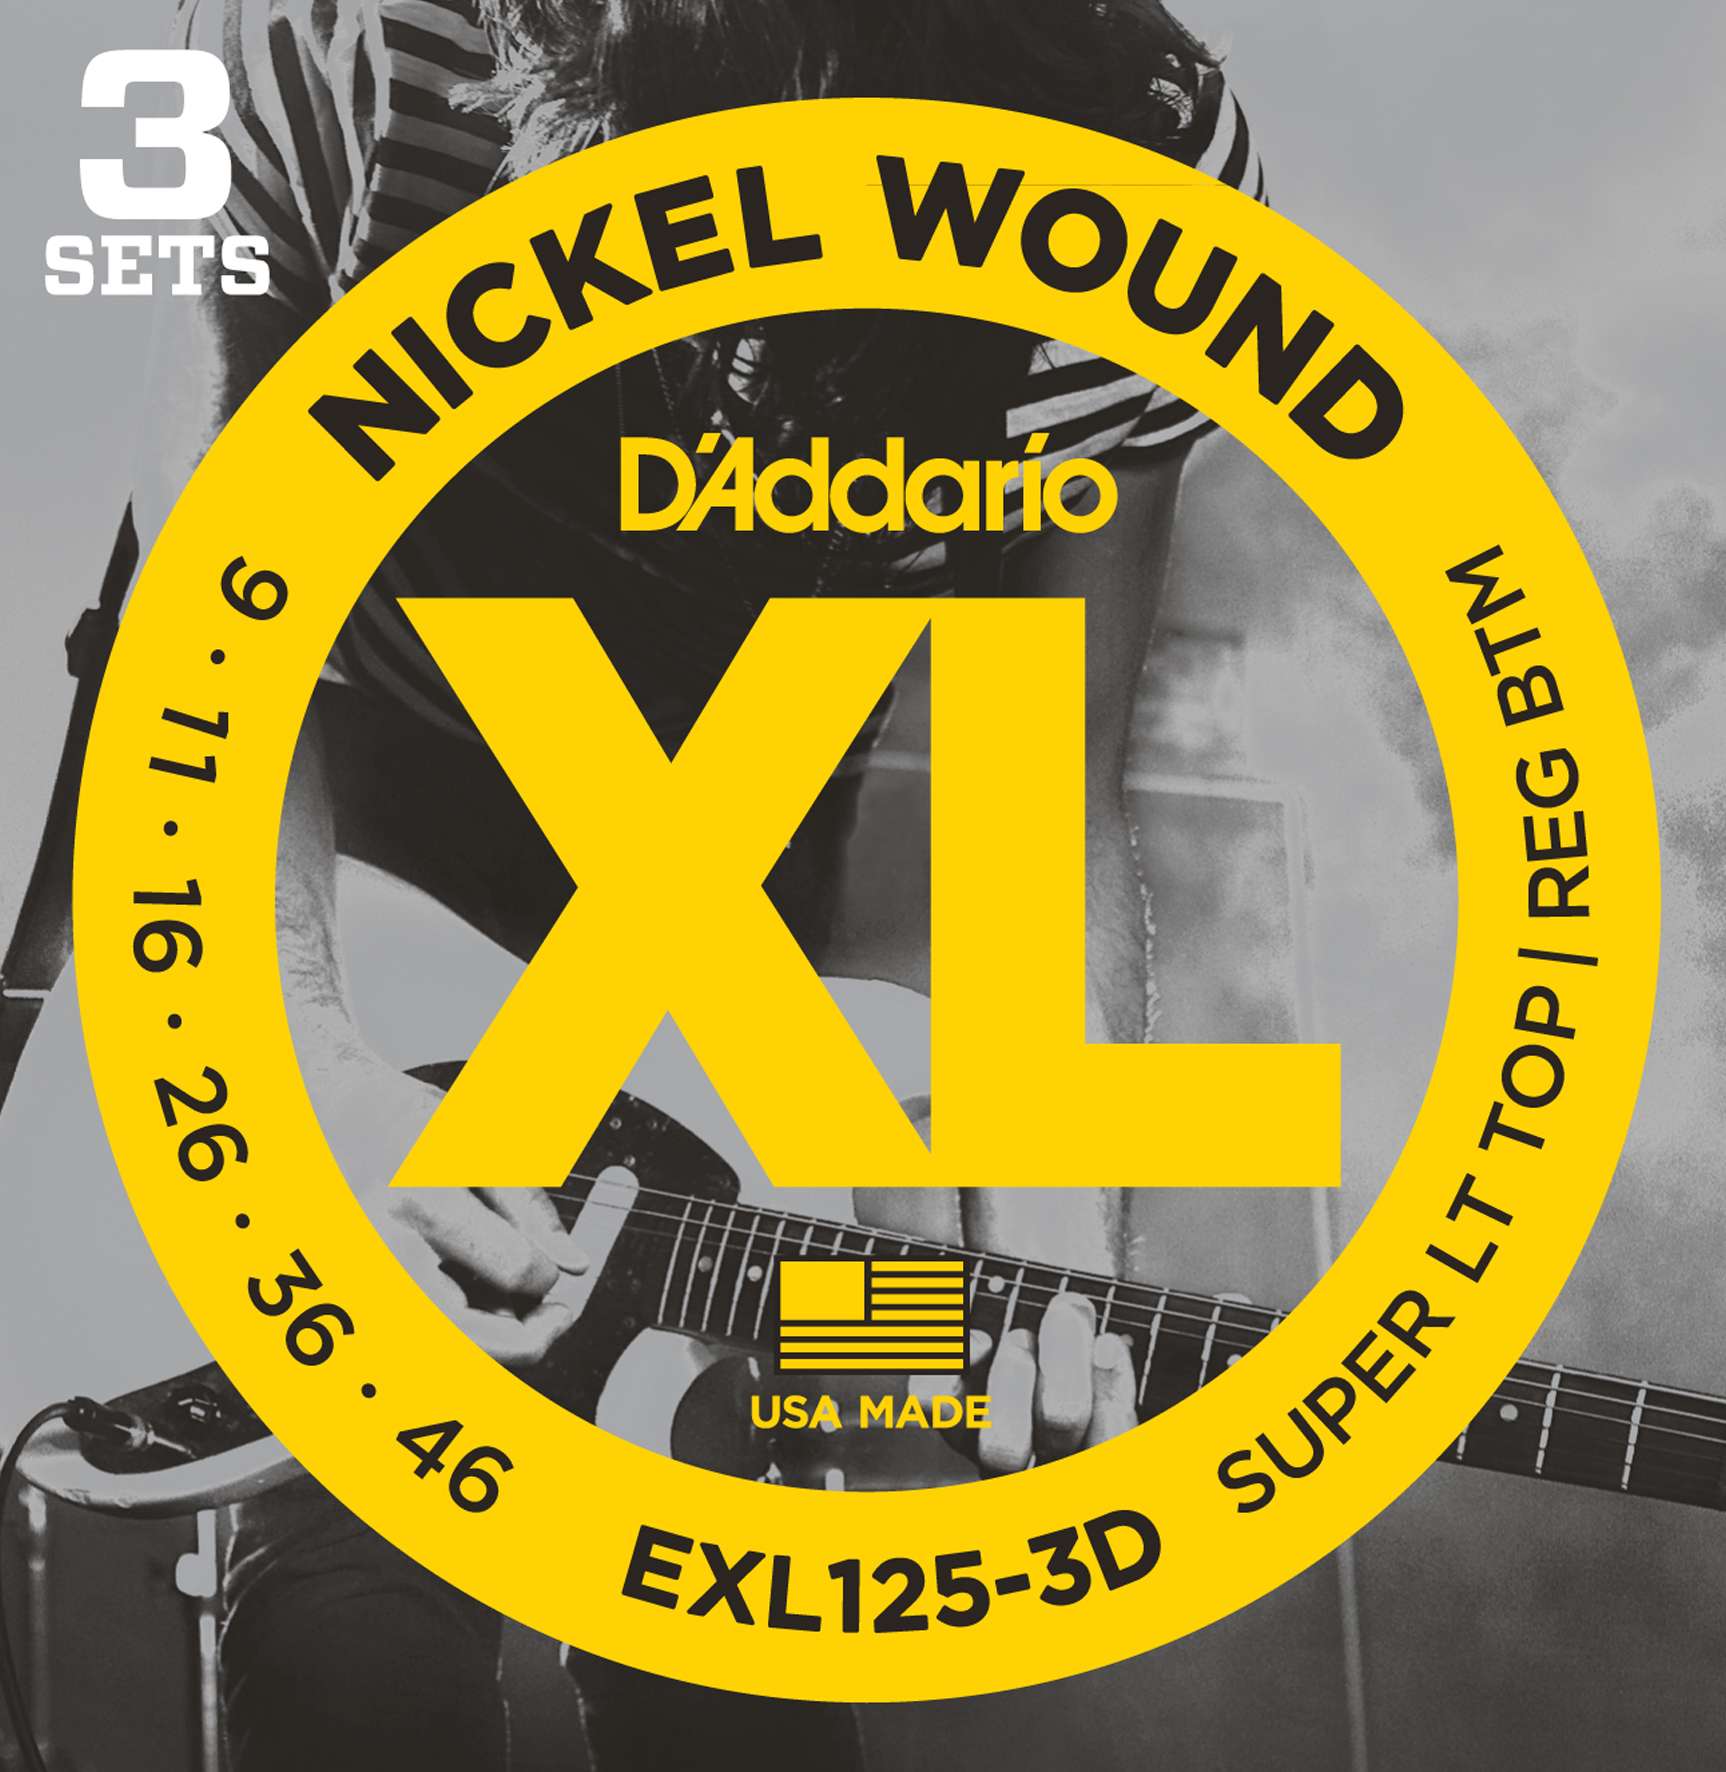 D'Addario EXL125-3D Nickel Wound Electric Guitar Strings, Super Light Top/Regula...